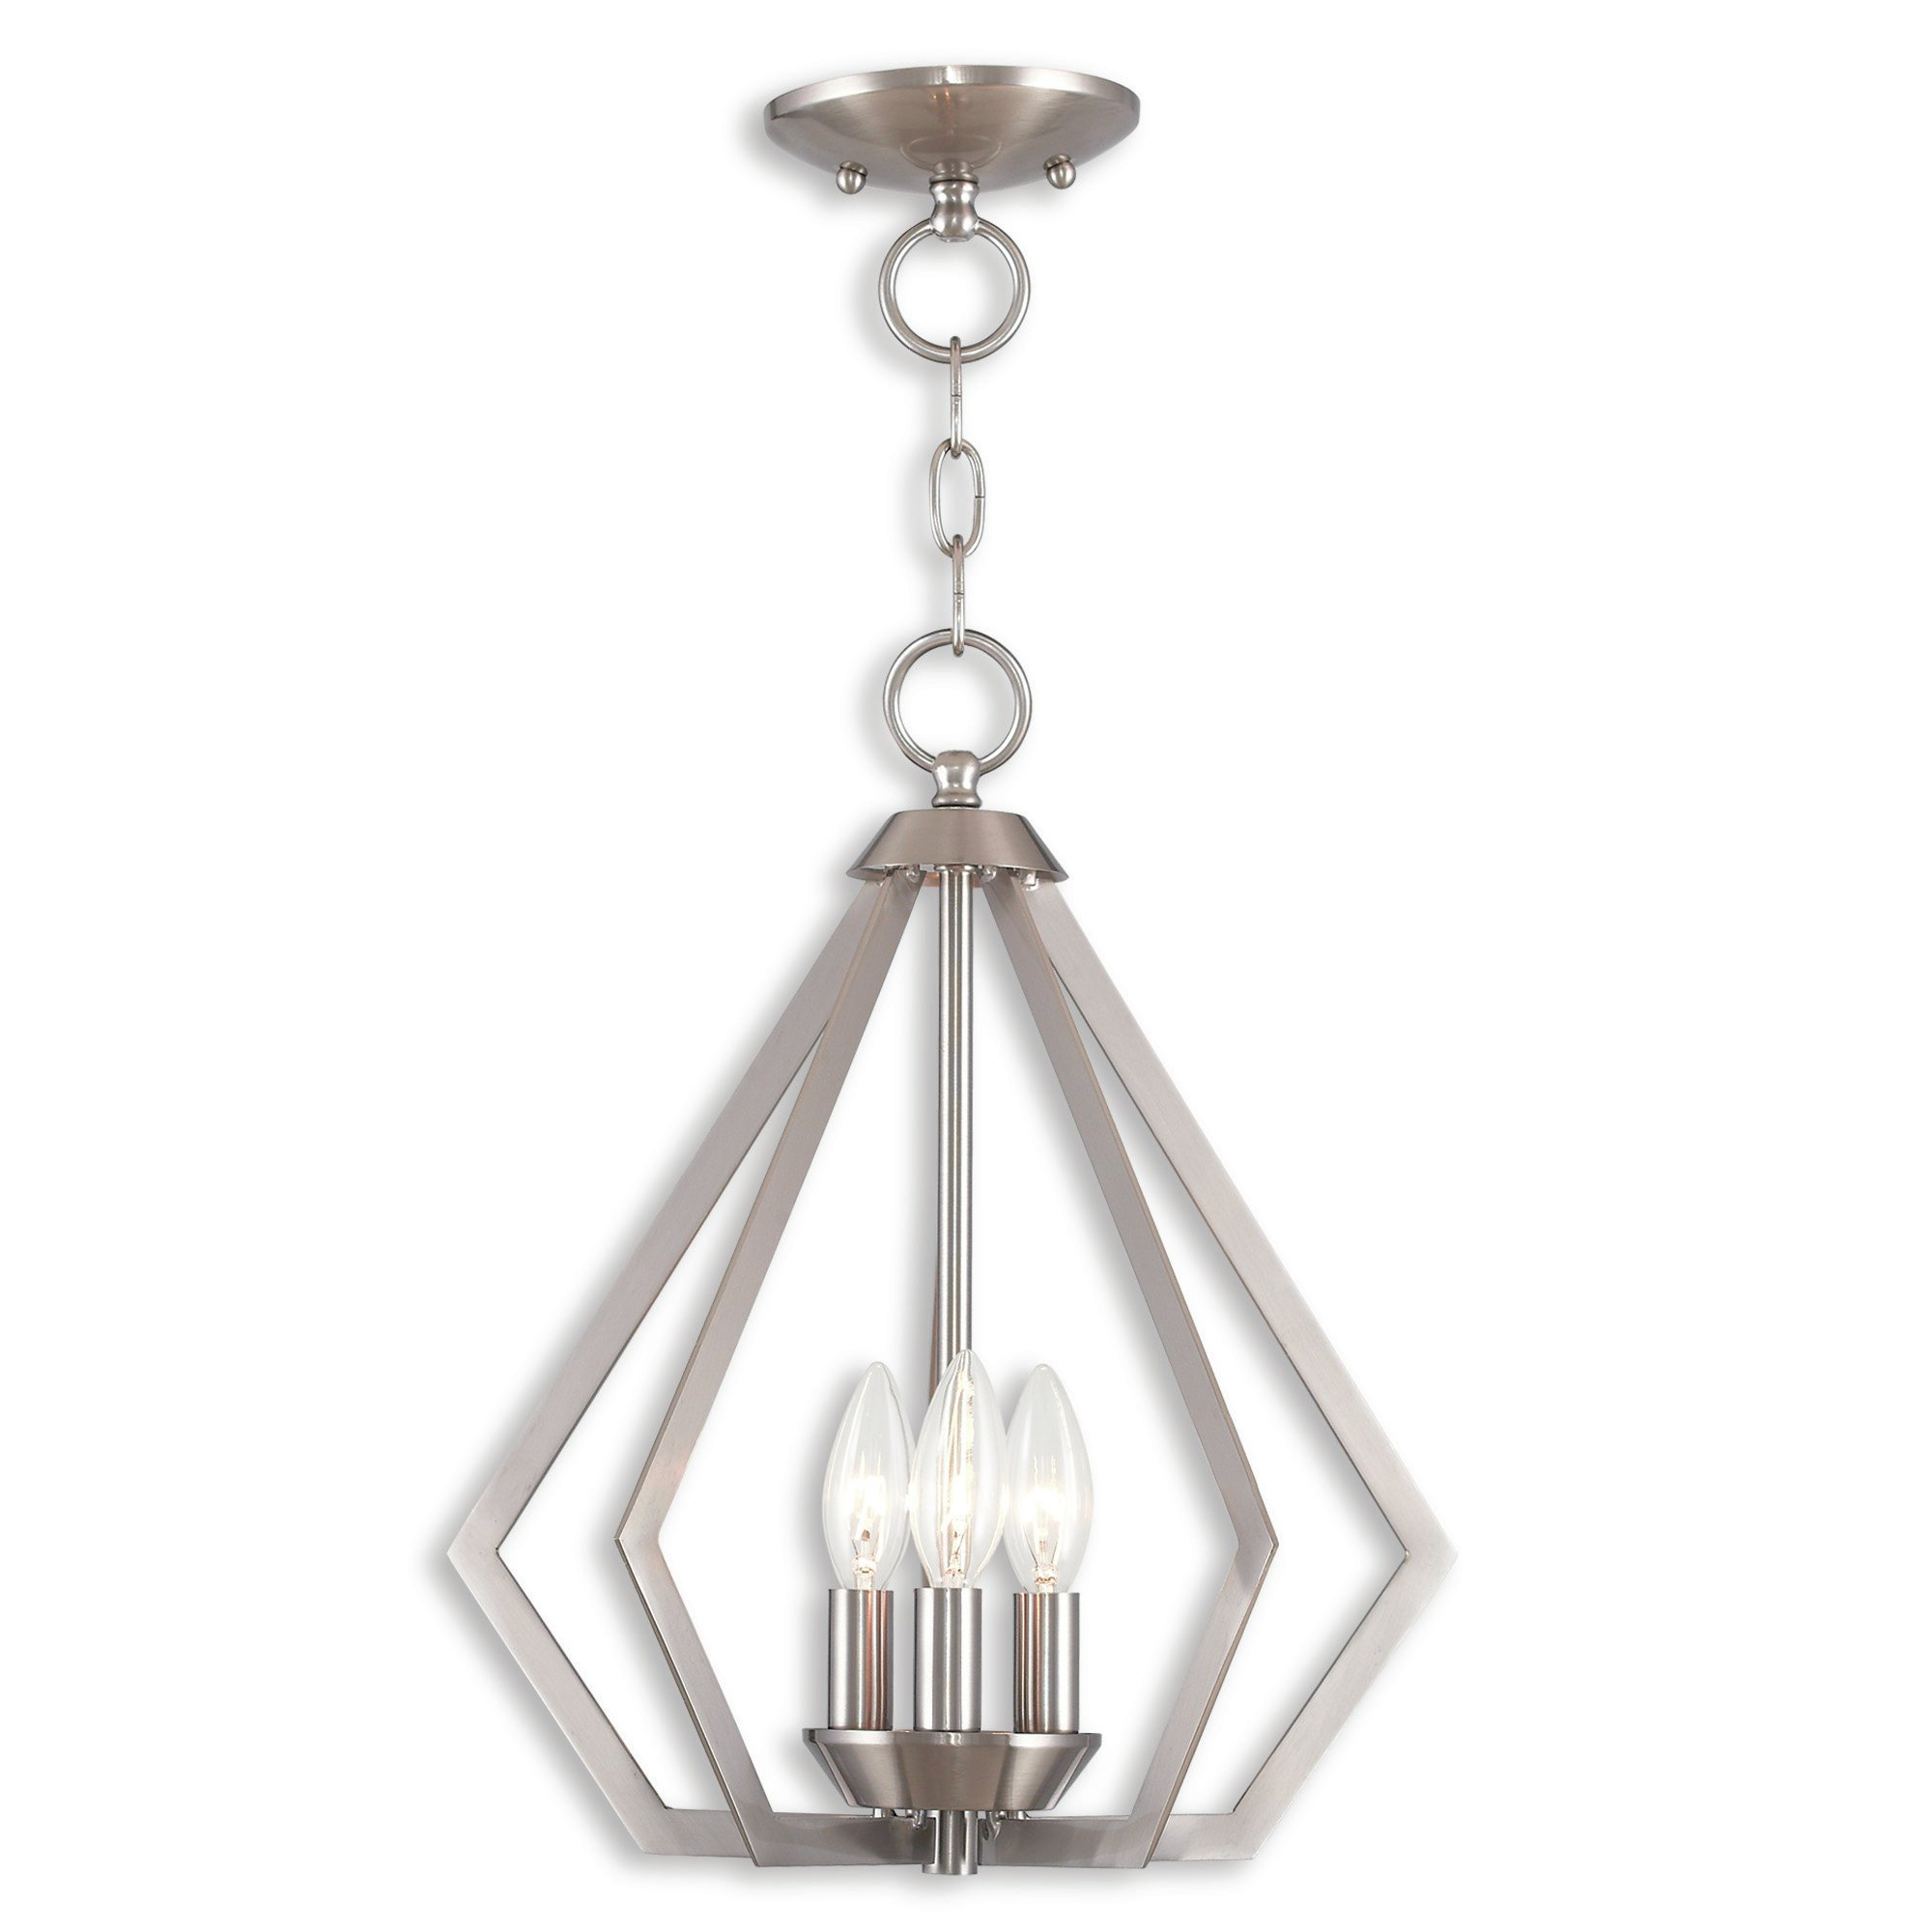 Borasisi 3 Light Lantern Geometric Pendant For Widely Used Chauvin 3 Light Lantern Geometric Pendants (View 3 of 20)